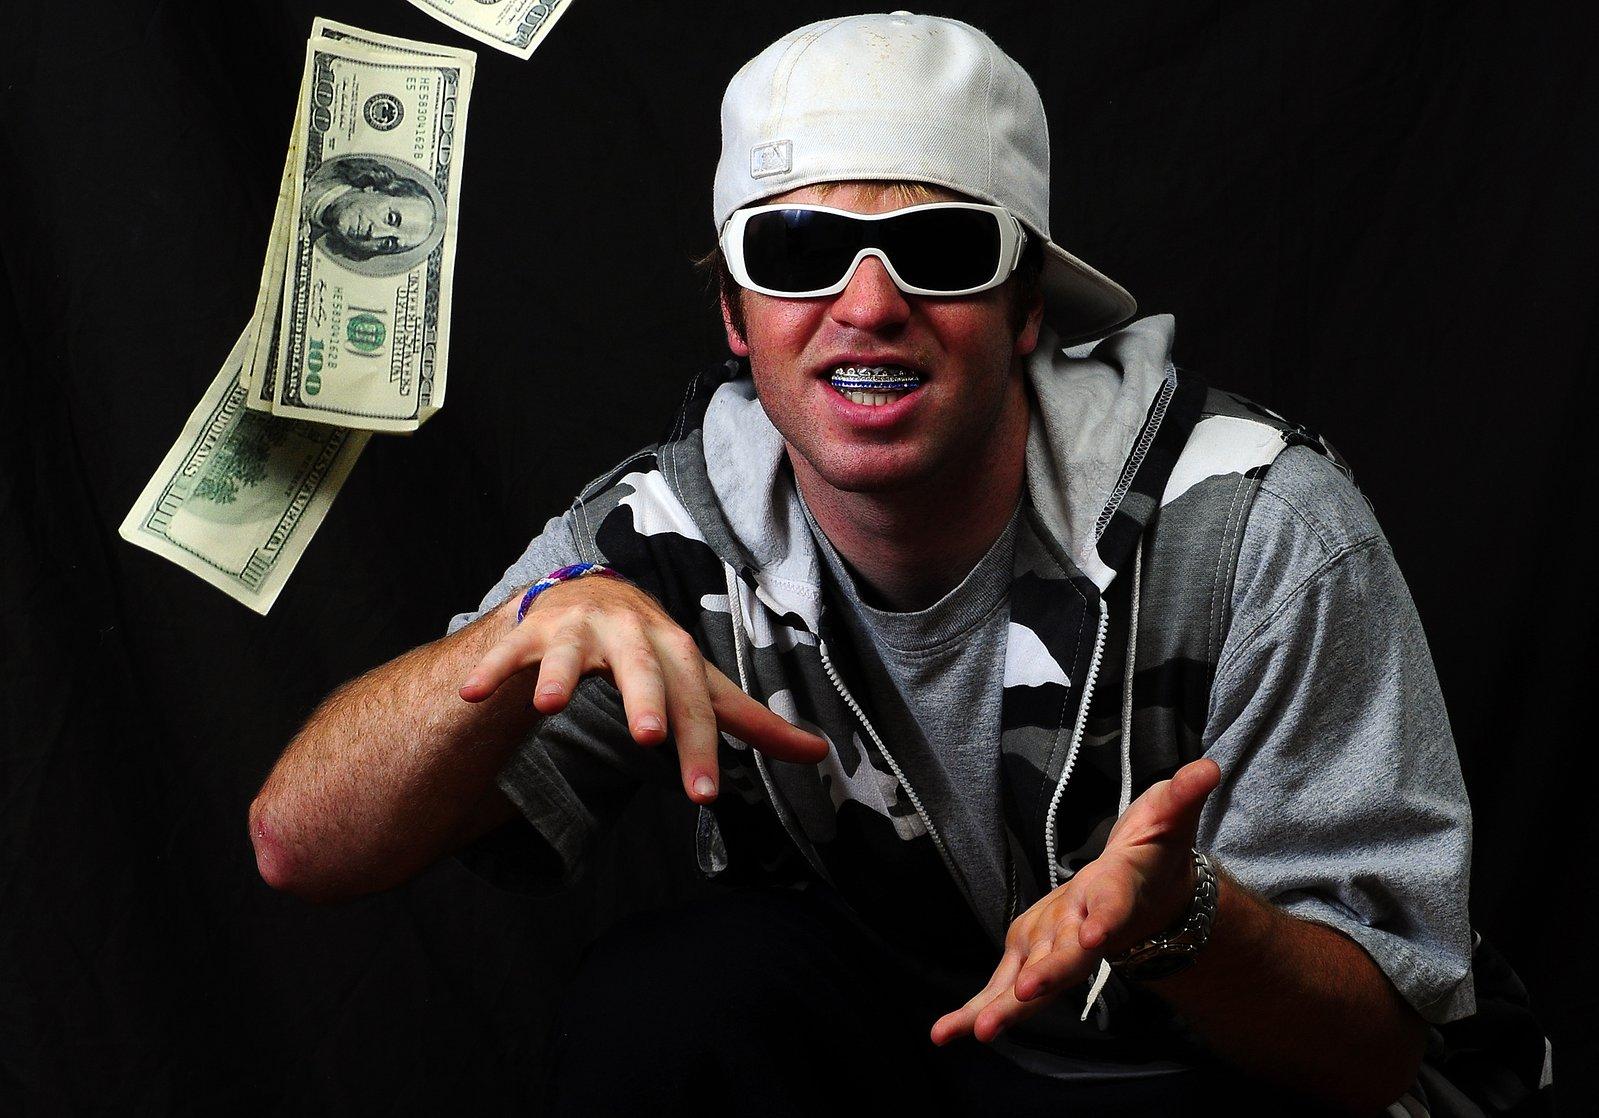 Throwin money